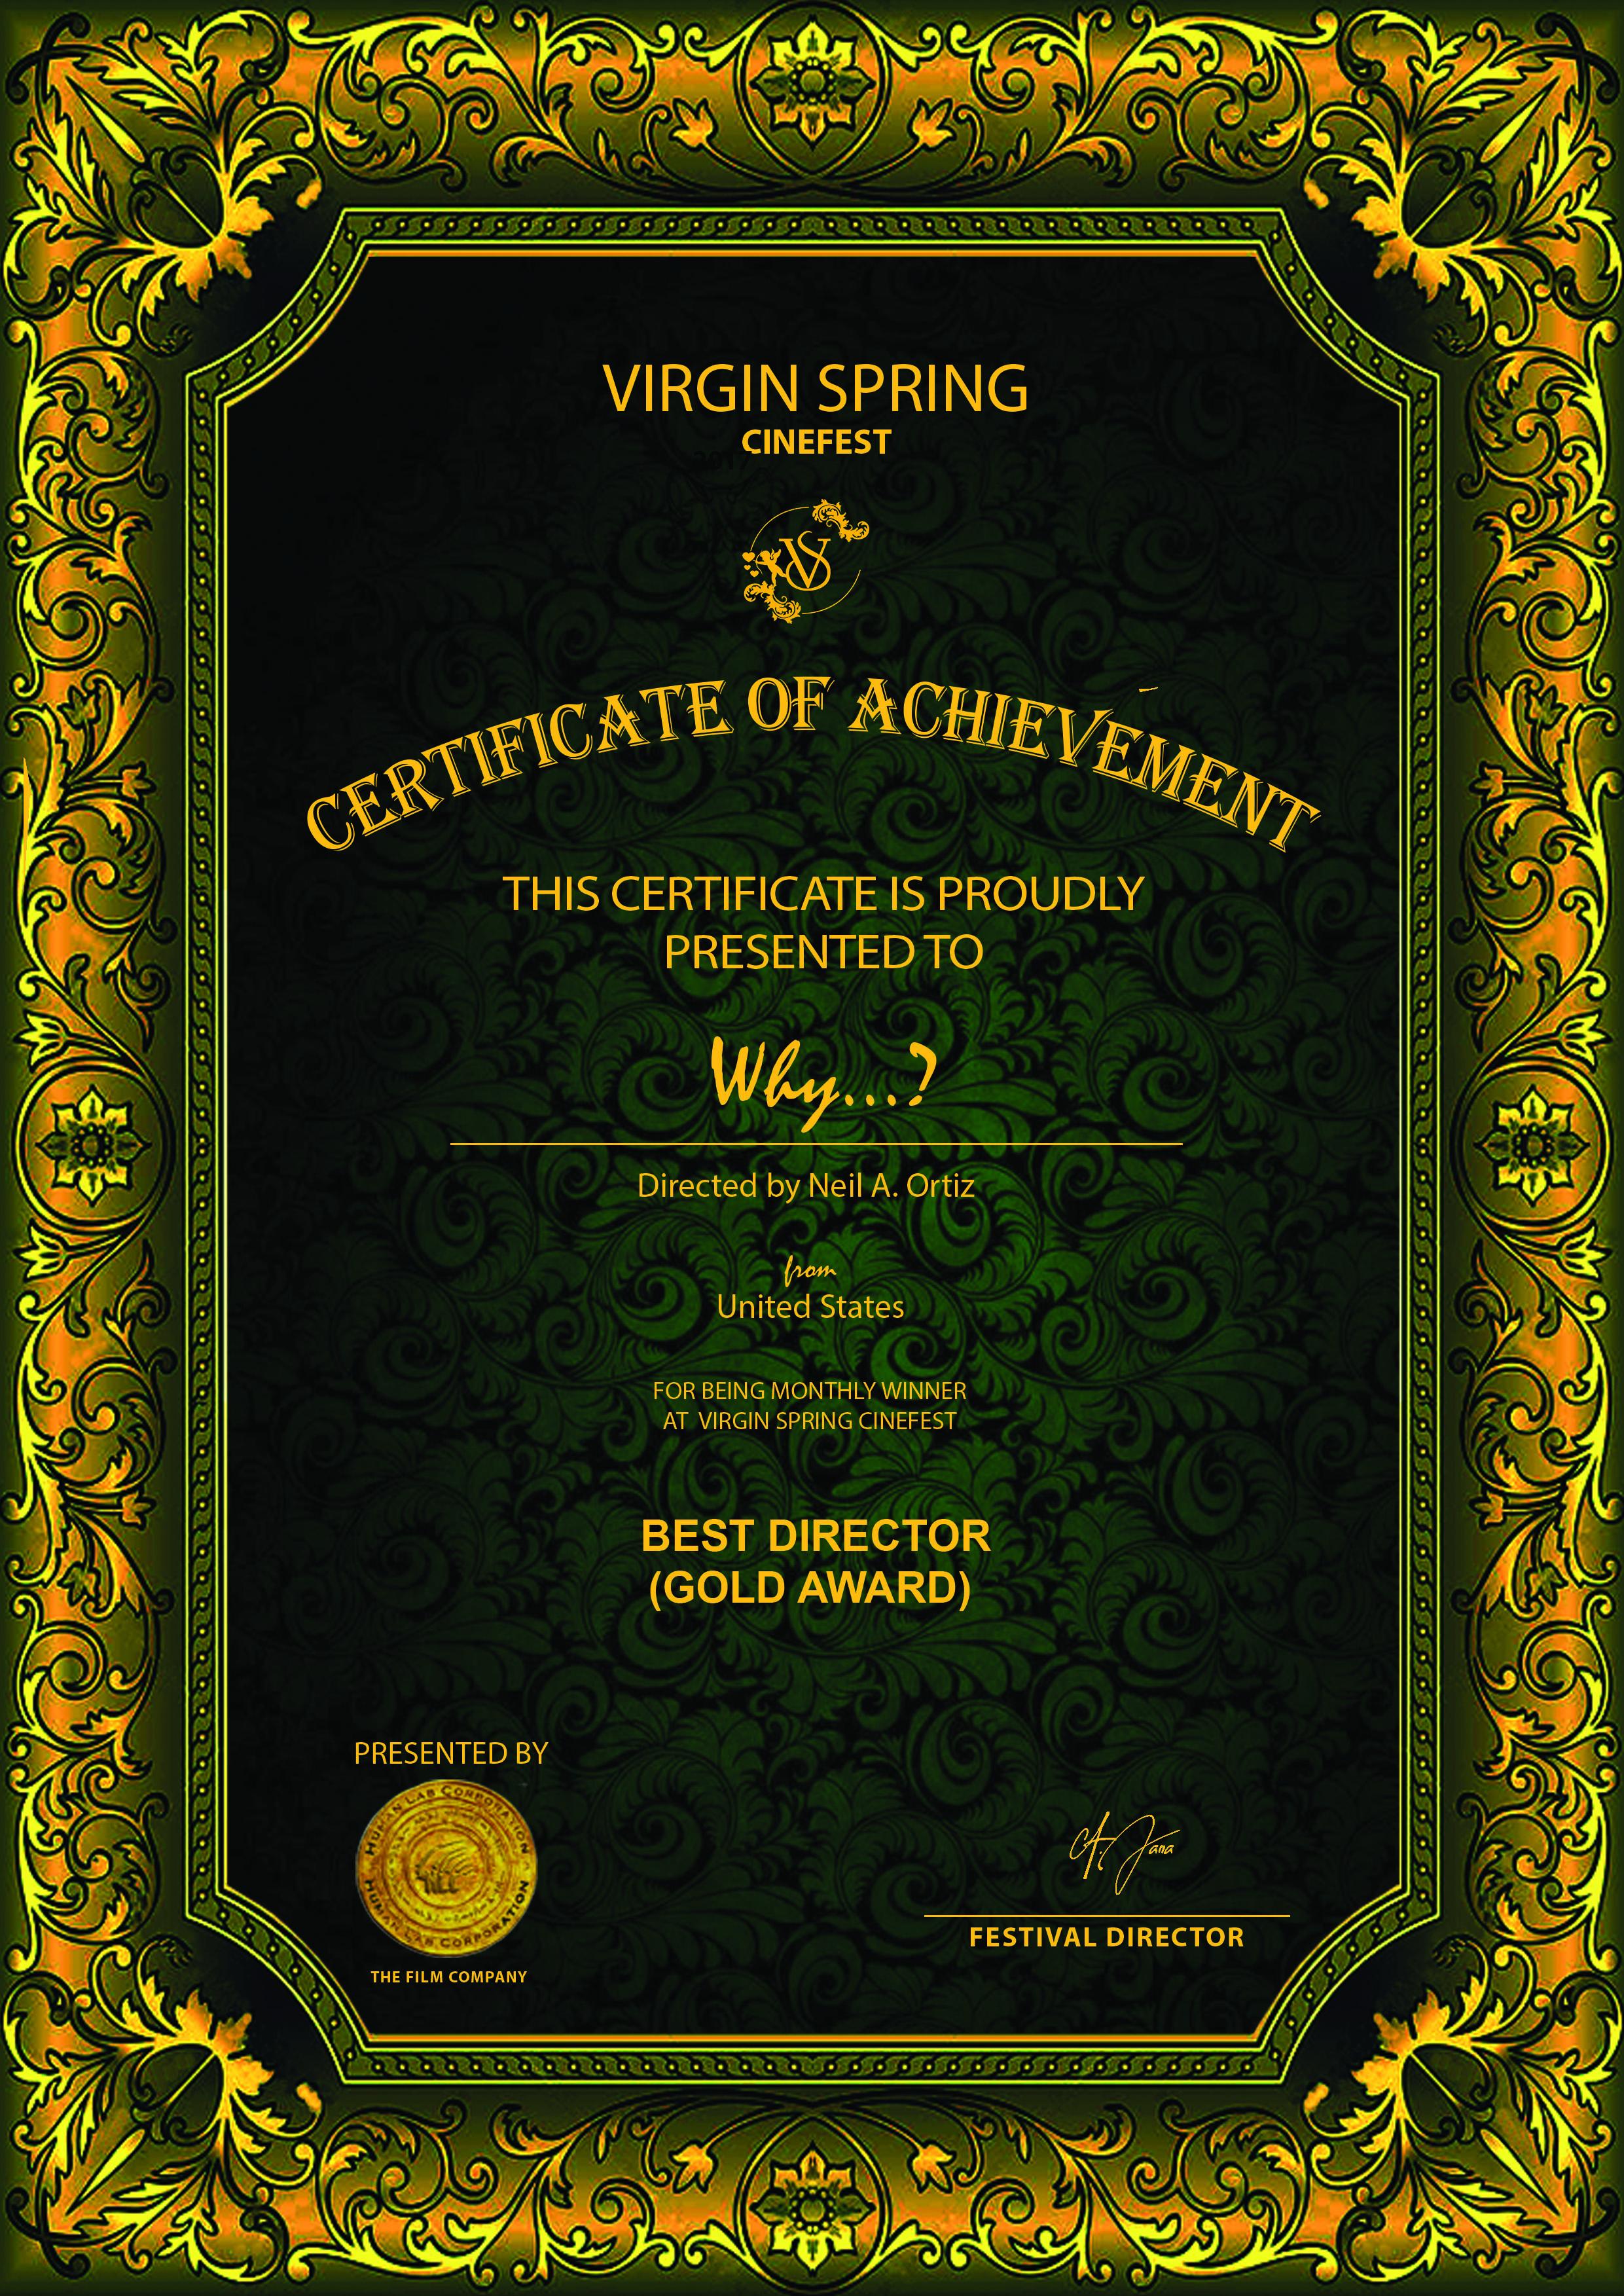 MONTHLY WINNER GOLD AWARD - BEST DIRECTOR